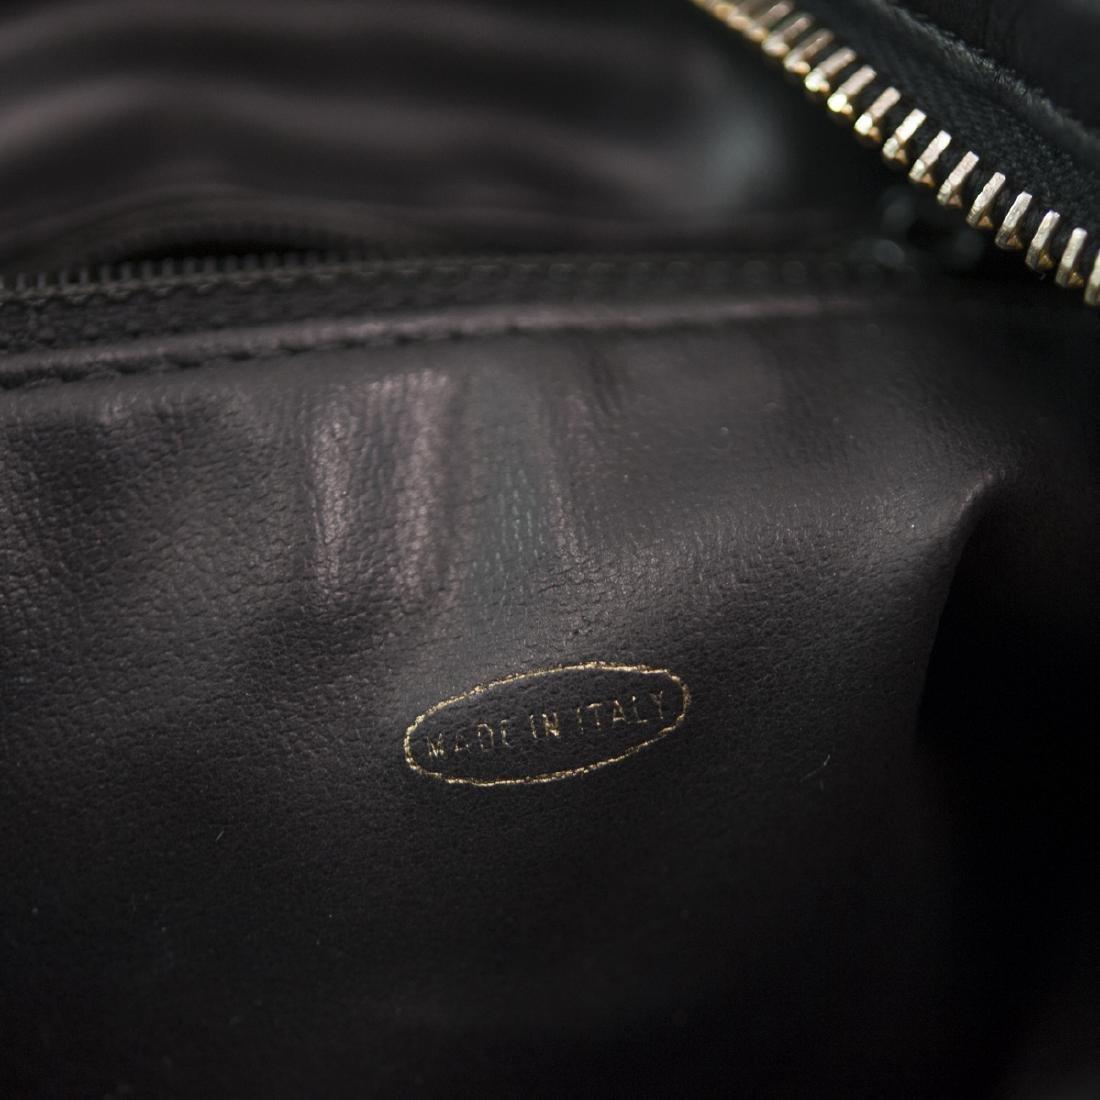 Chanel Black Leather Purse - 3